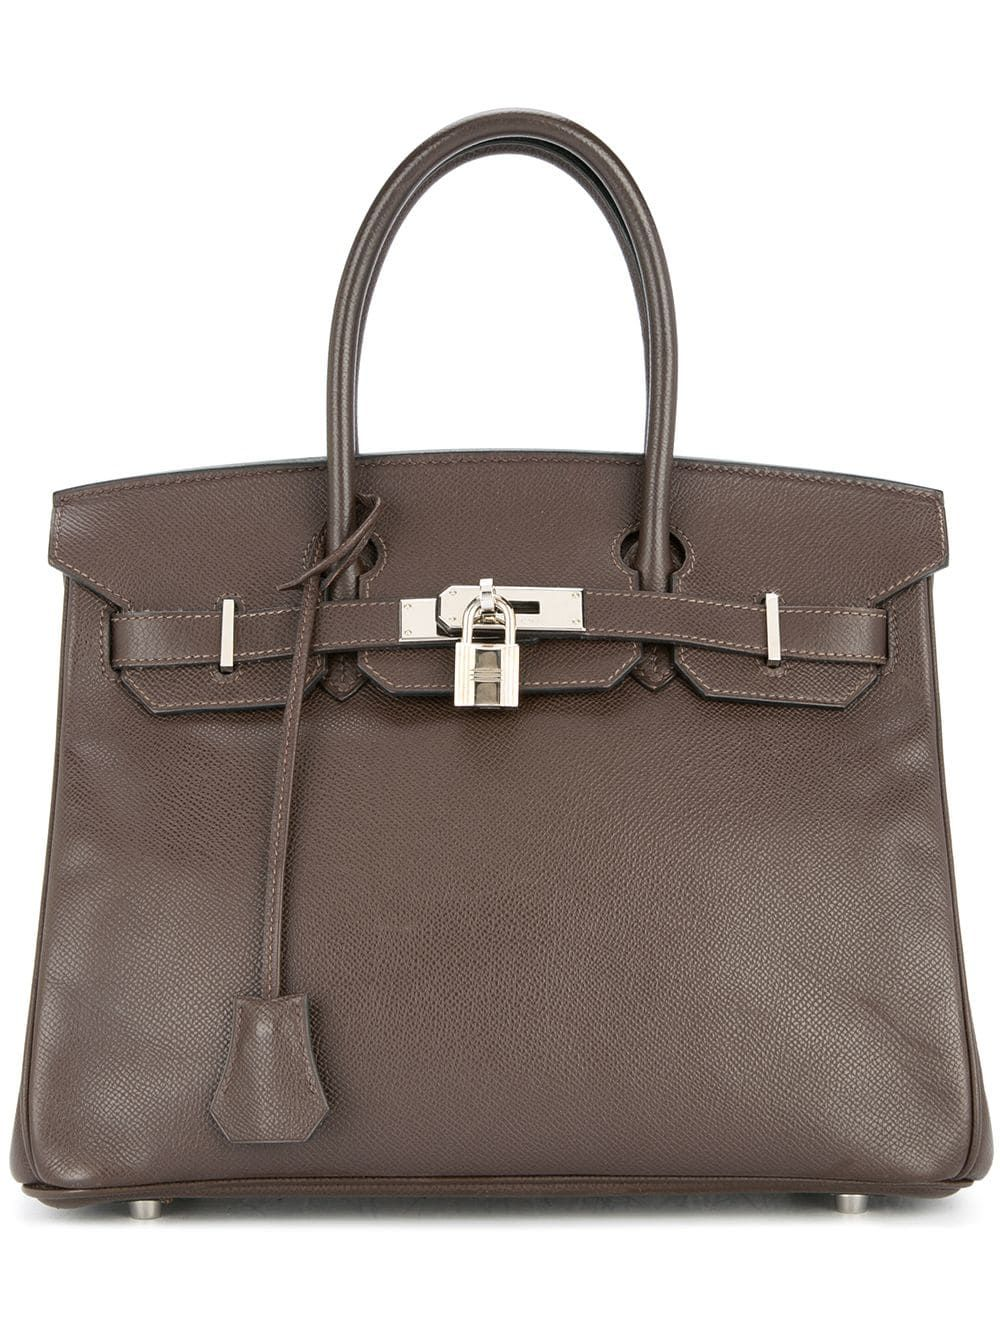 c584ac2b2744 Hermès Vintage Сумка 'Birkin 30' в 2019 г. | bags | Hermes birkin ...